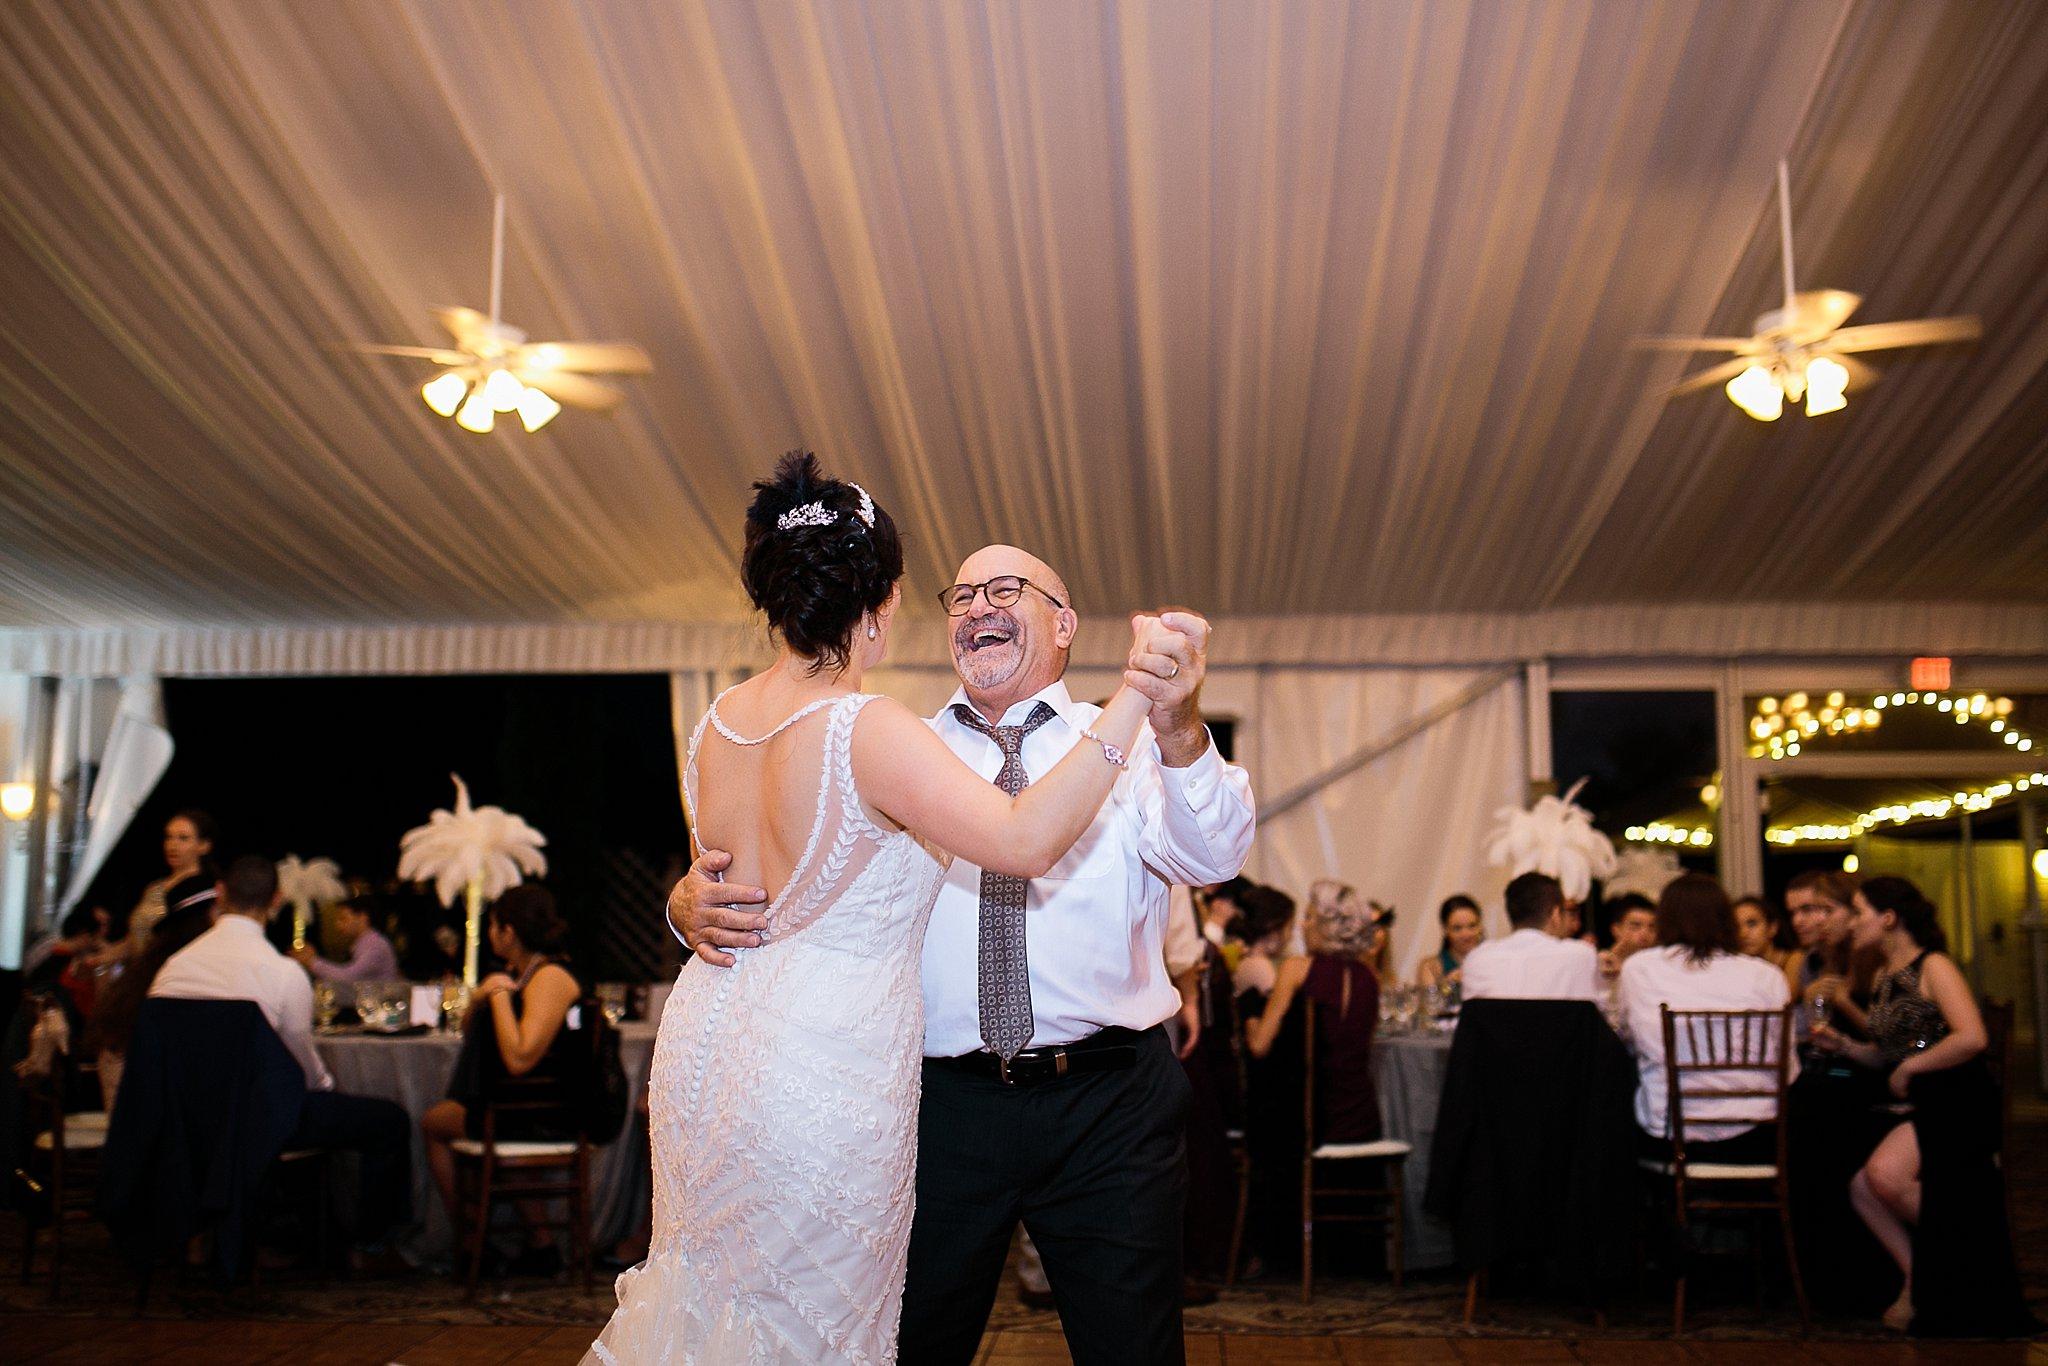 West Hills Country Club Wedding Gatsby Wedding Roaring Twenties Wedding Hudson Valley Wedding Photographer Sweet Alice Photography68.jpg